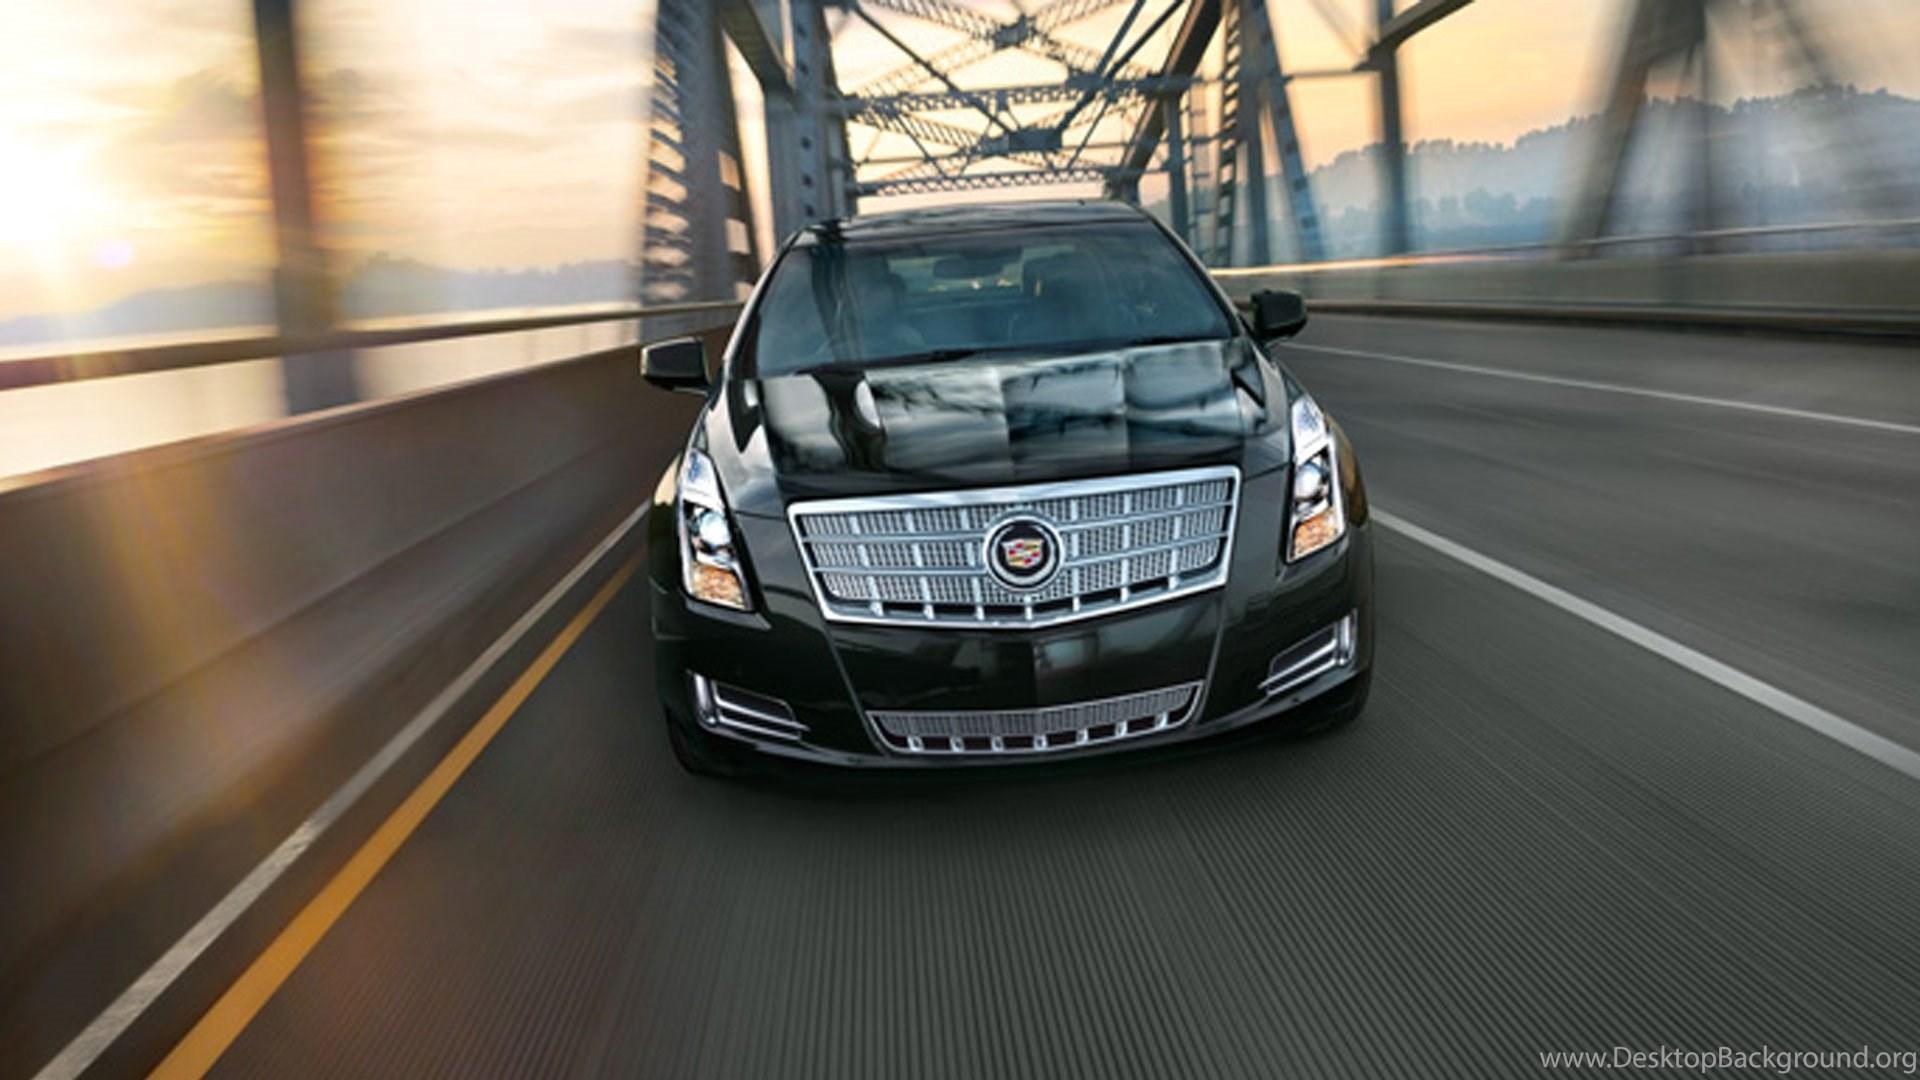 2016 Cadillac Escalade Black Wallpapers Car 9726 Adamjford Com